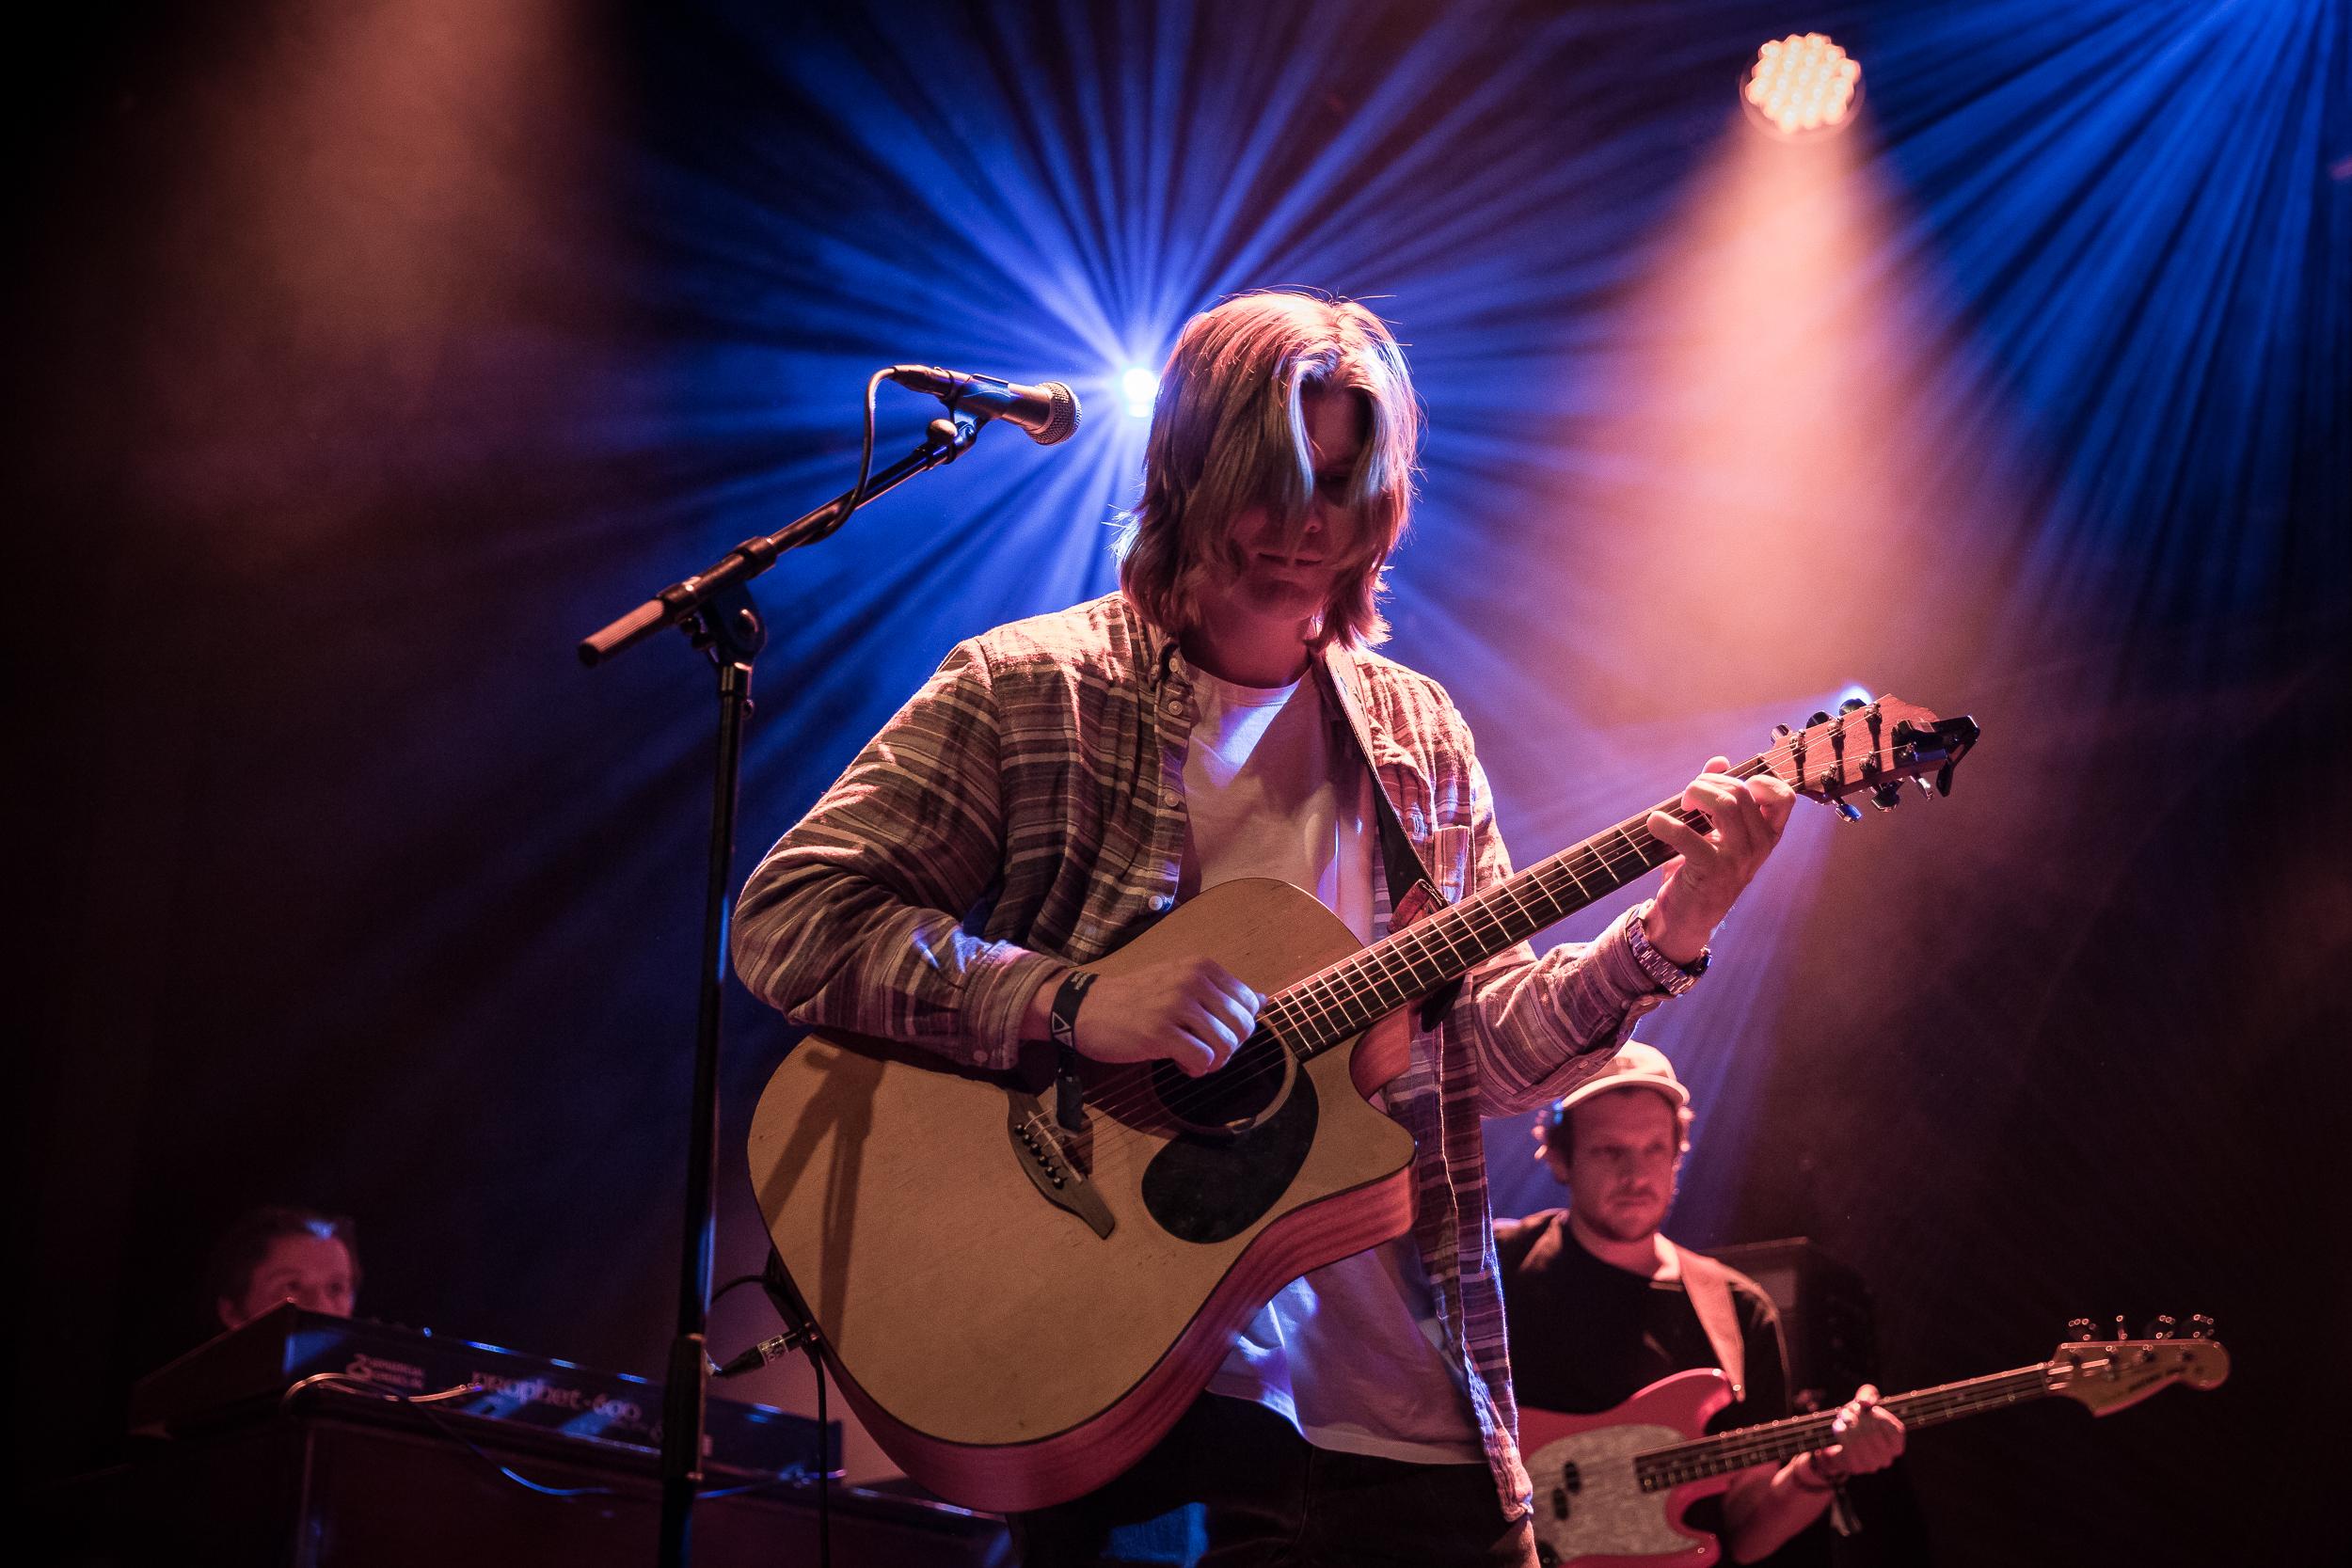 Kristian Torgalsen live at Trondheim Calling